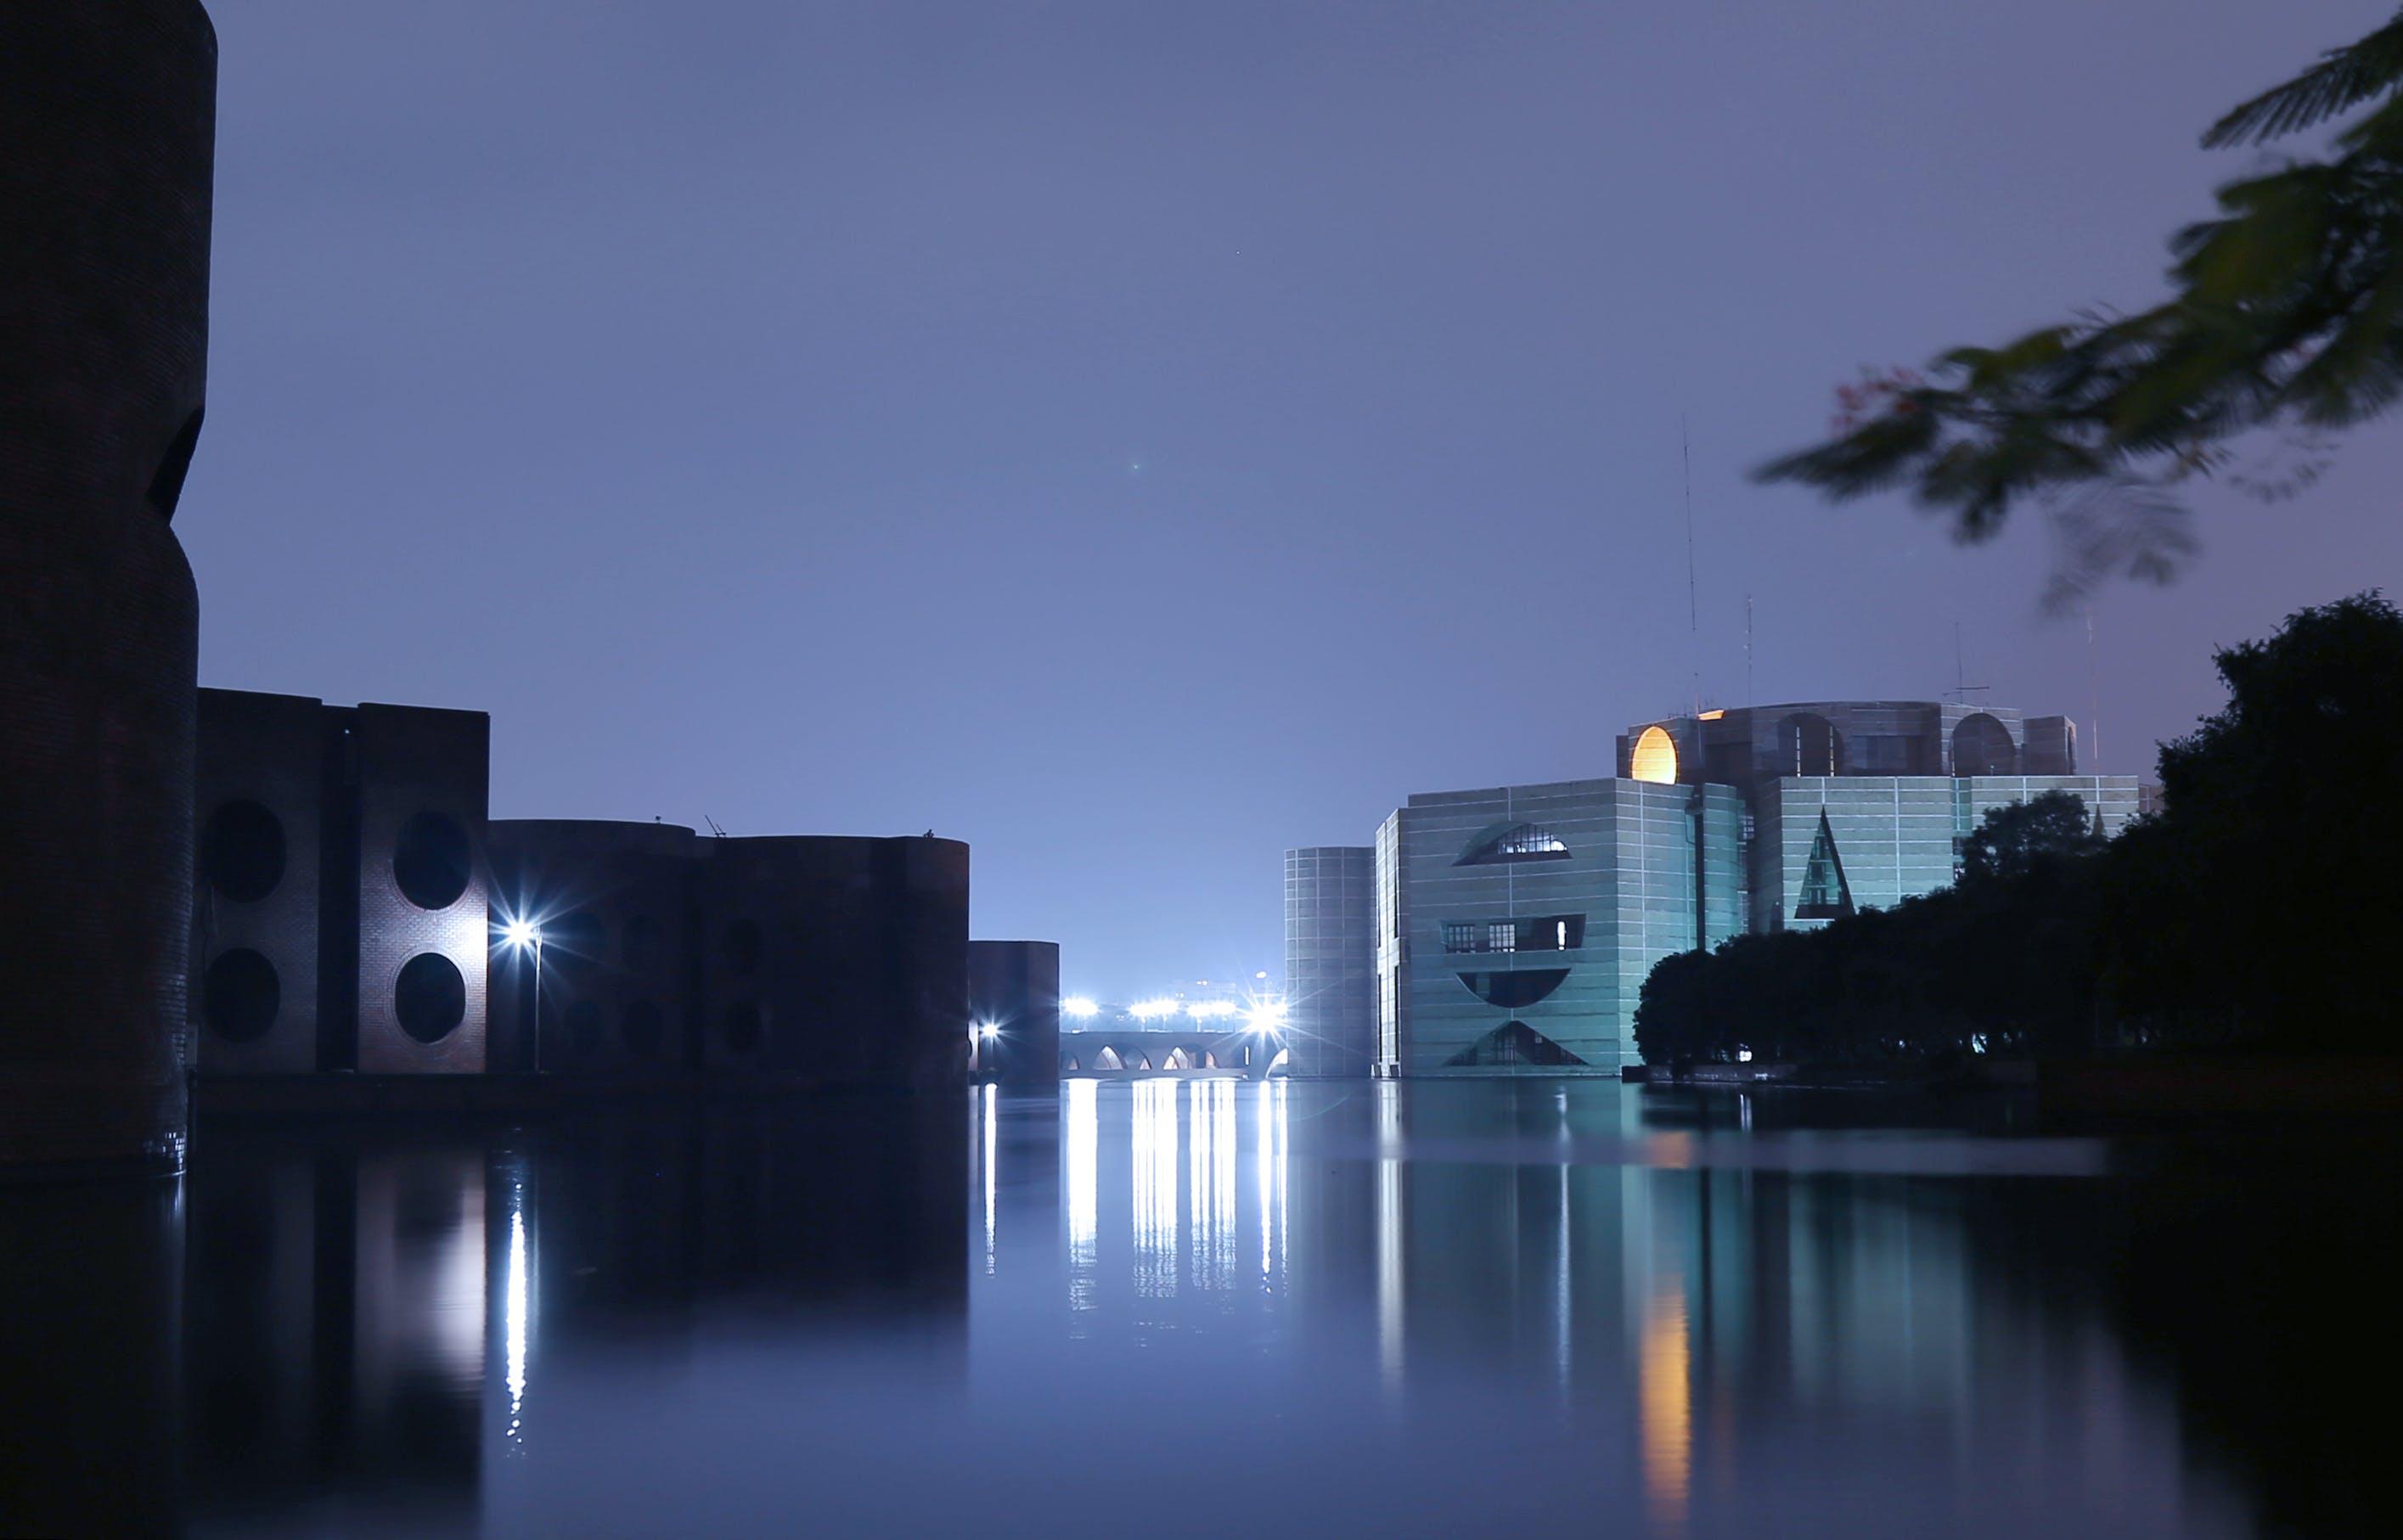 Free stock photo of city, night, parliament house of bangladesh